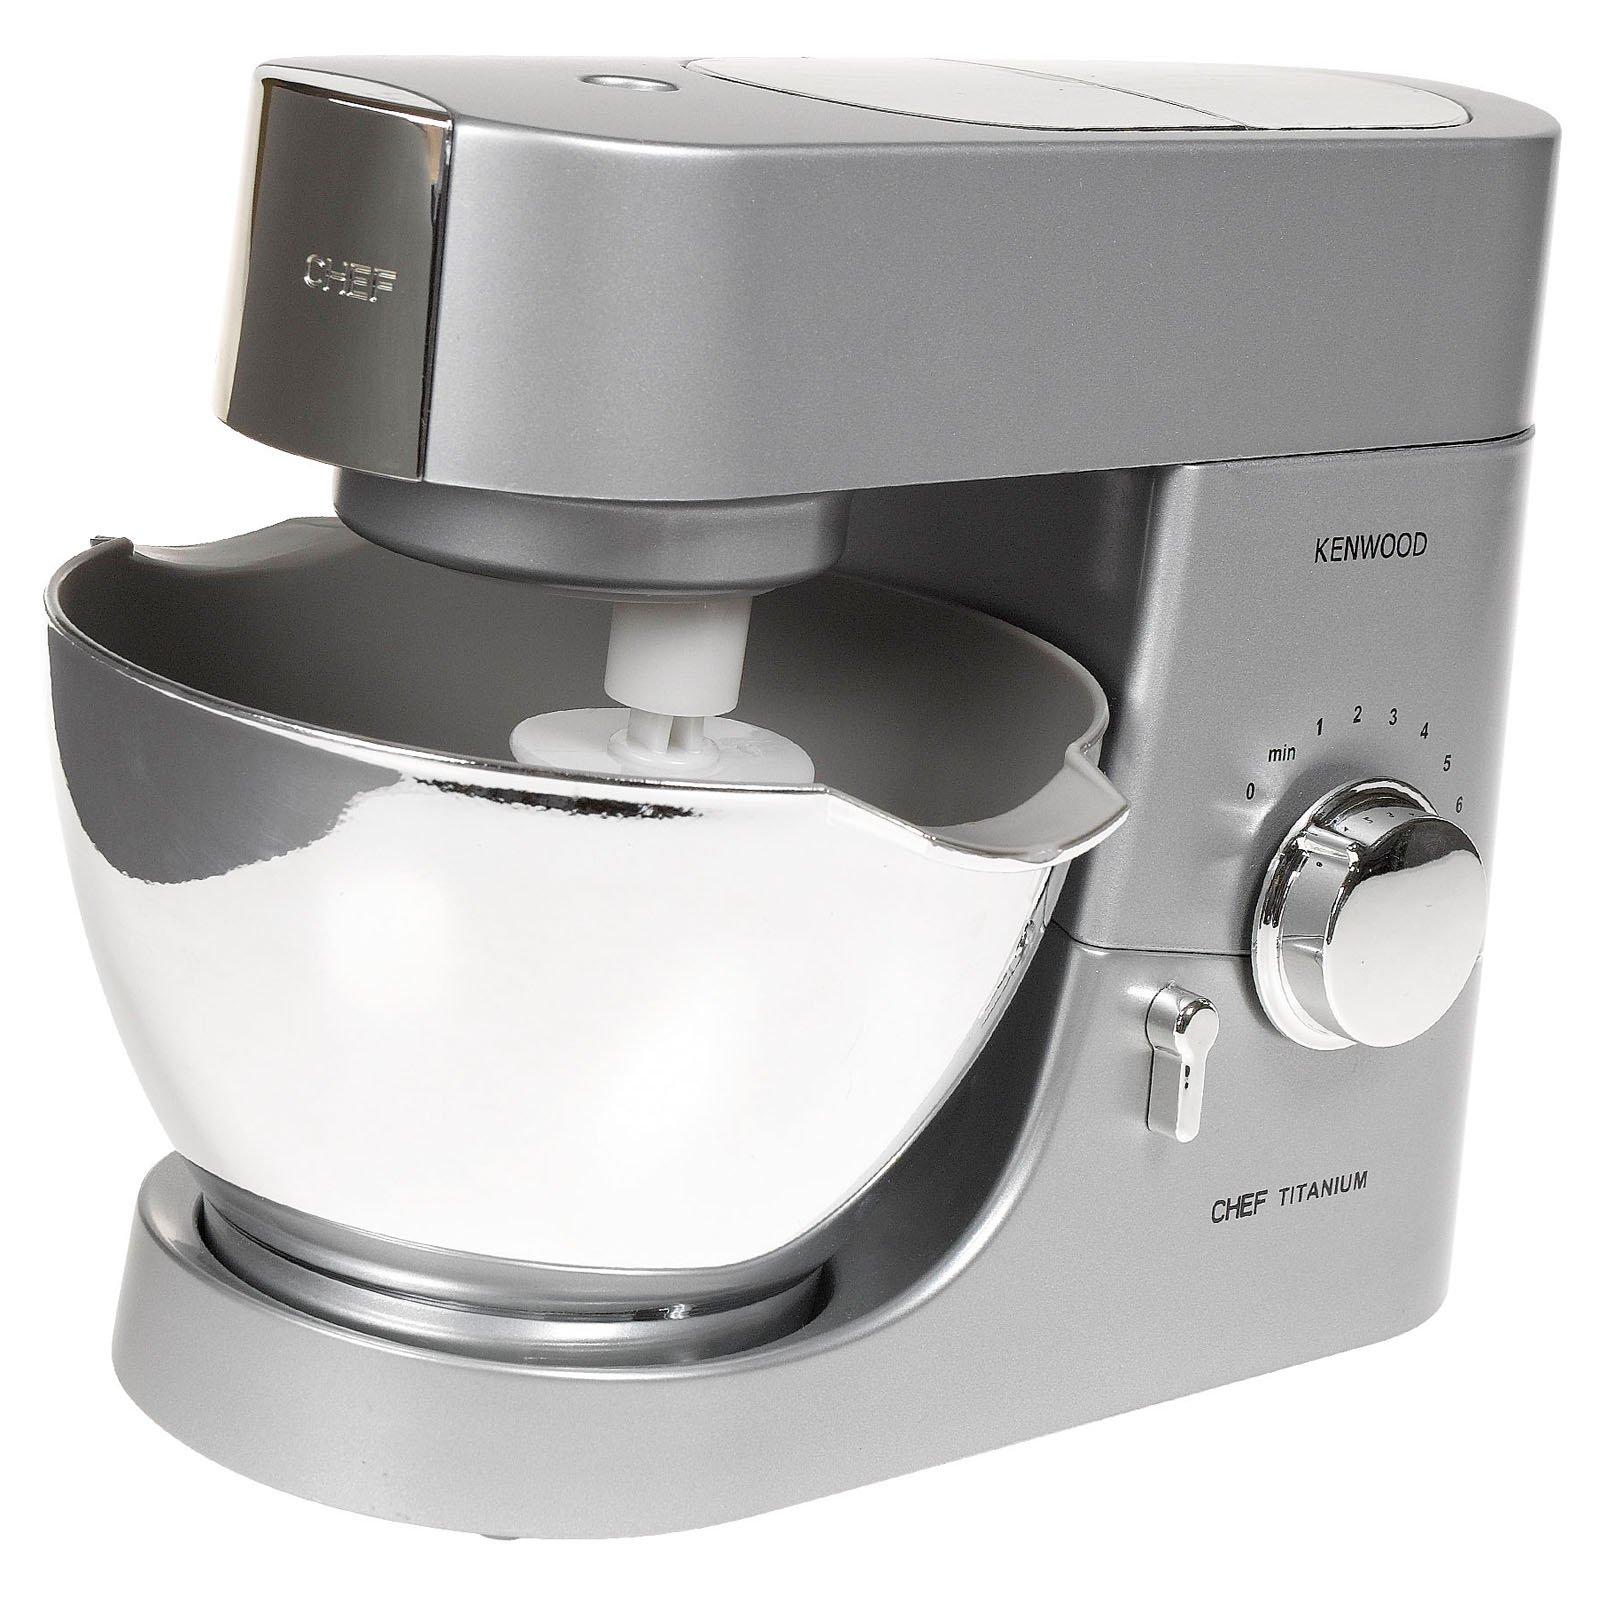 casdon kenwood mixer walmartcom - Kennwood Kitchen